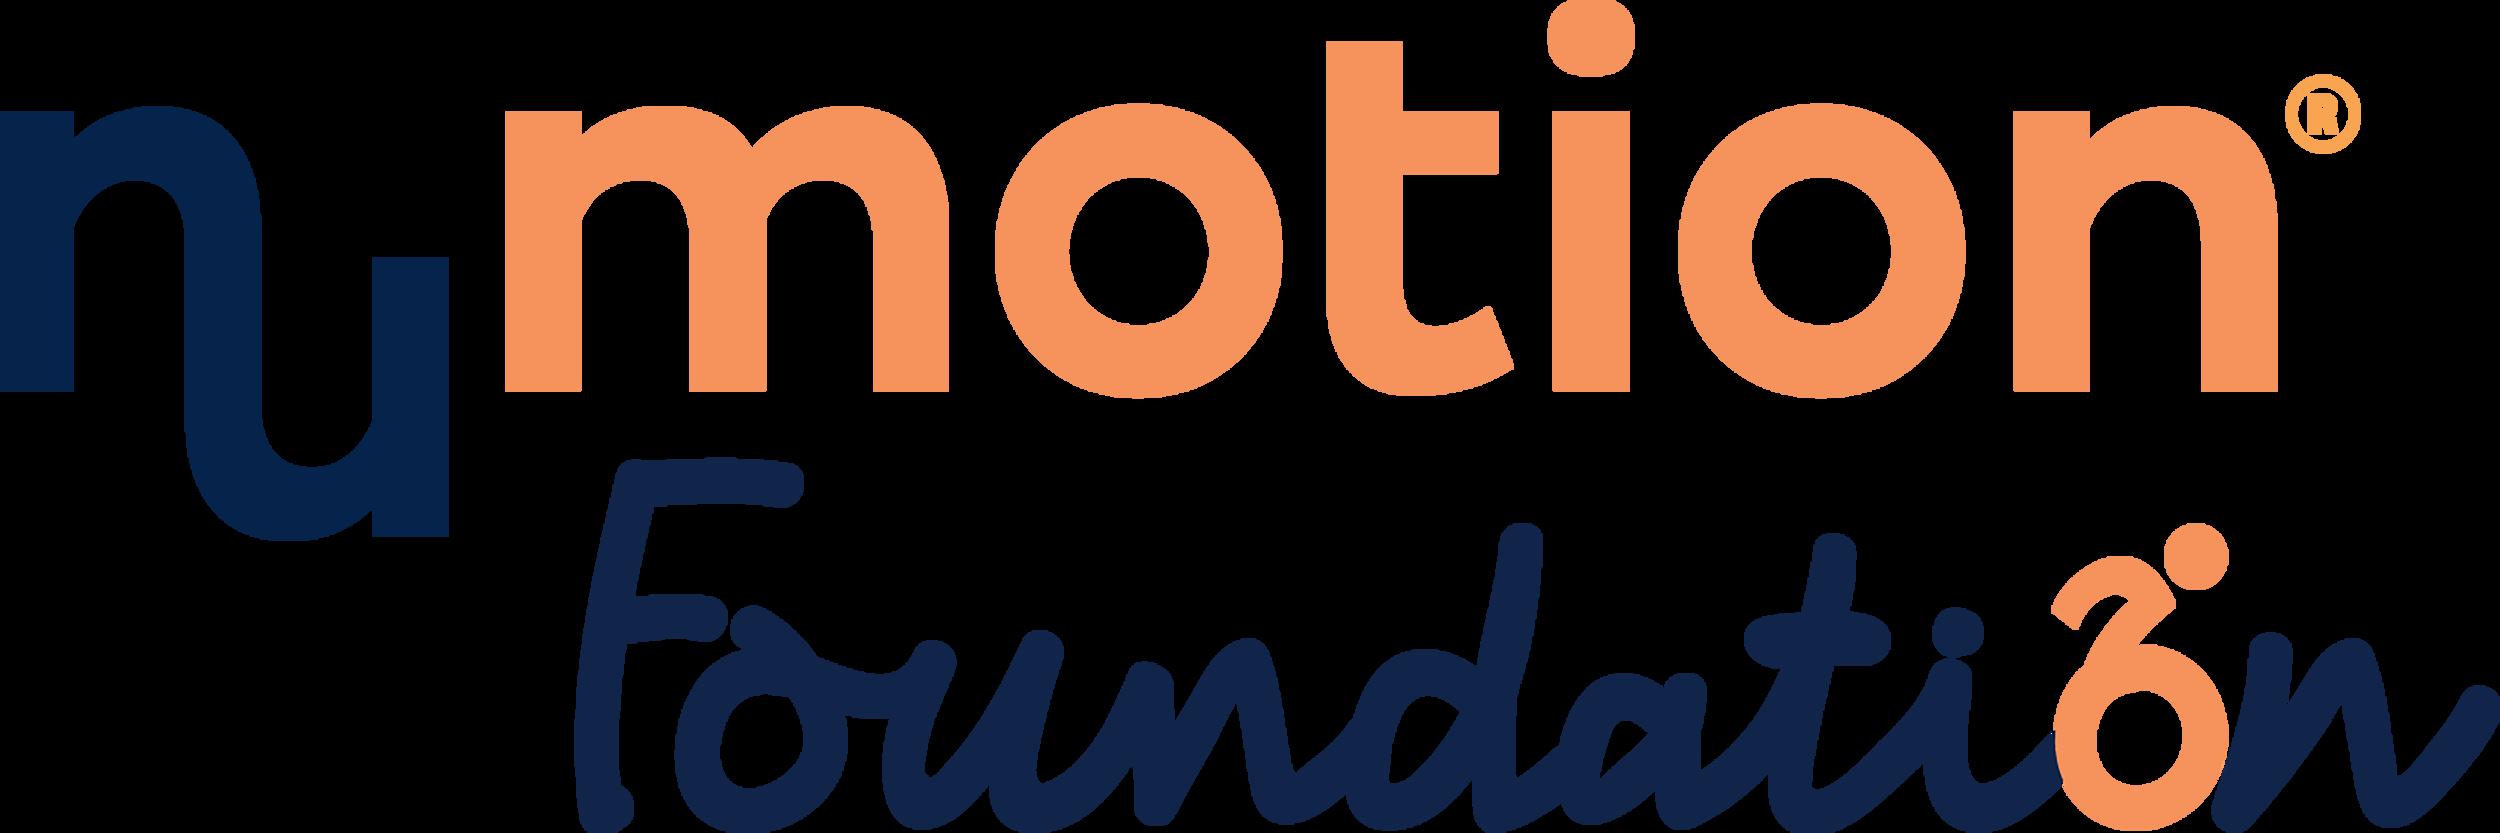 Numotion Foundation logo_CMYK.PNG